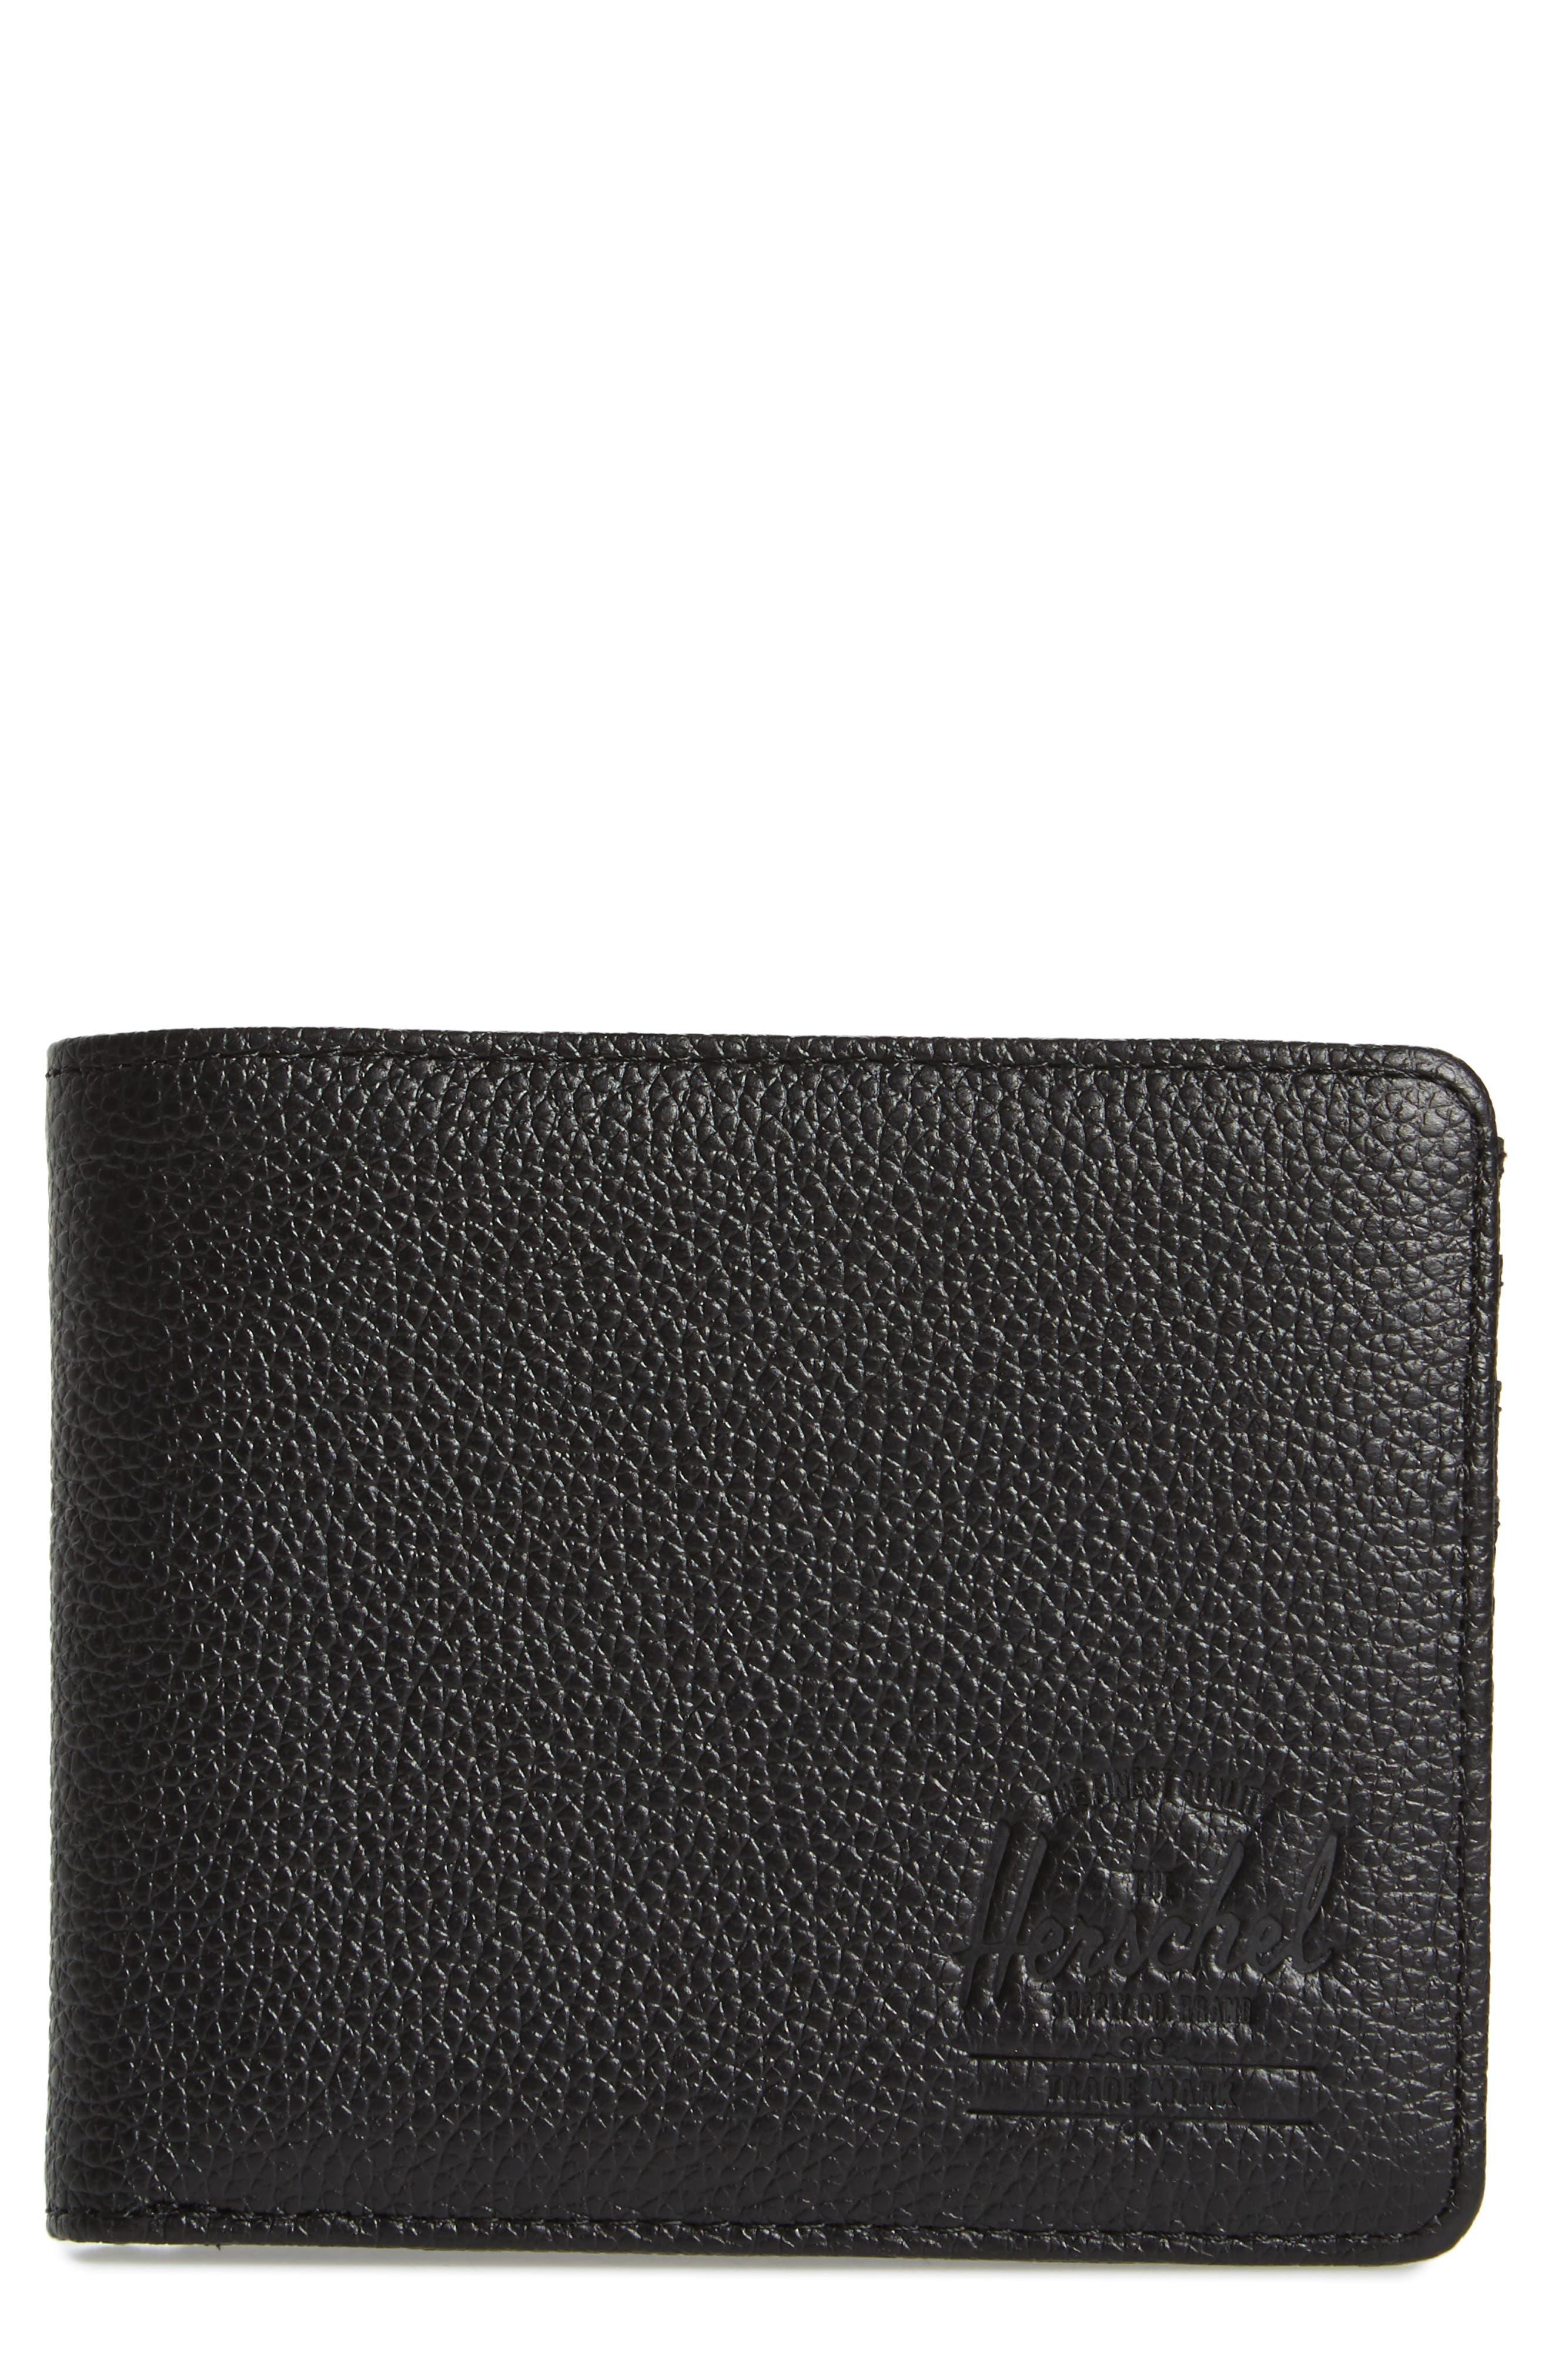 Main Image - Herschel Supply Co. Tile Roy Leather Bifold Wallet